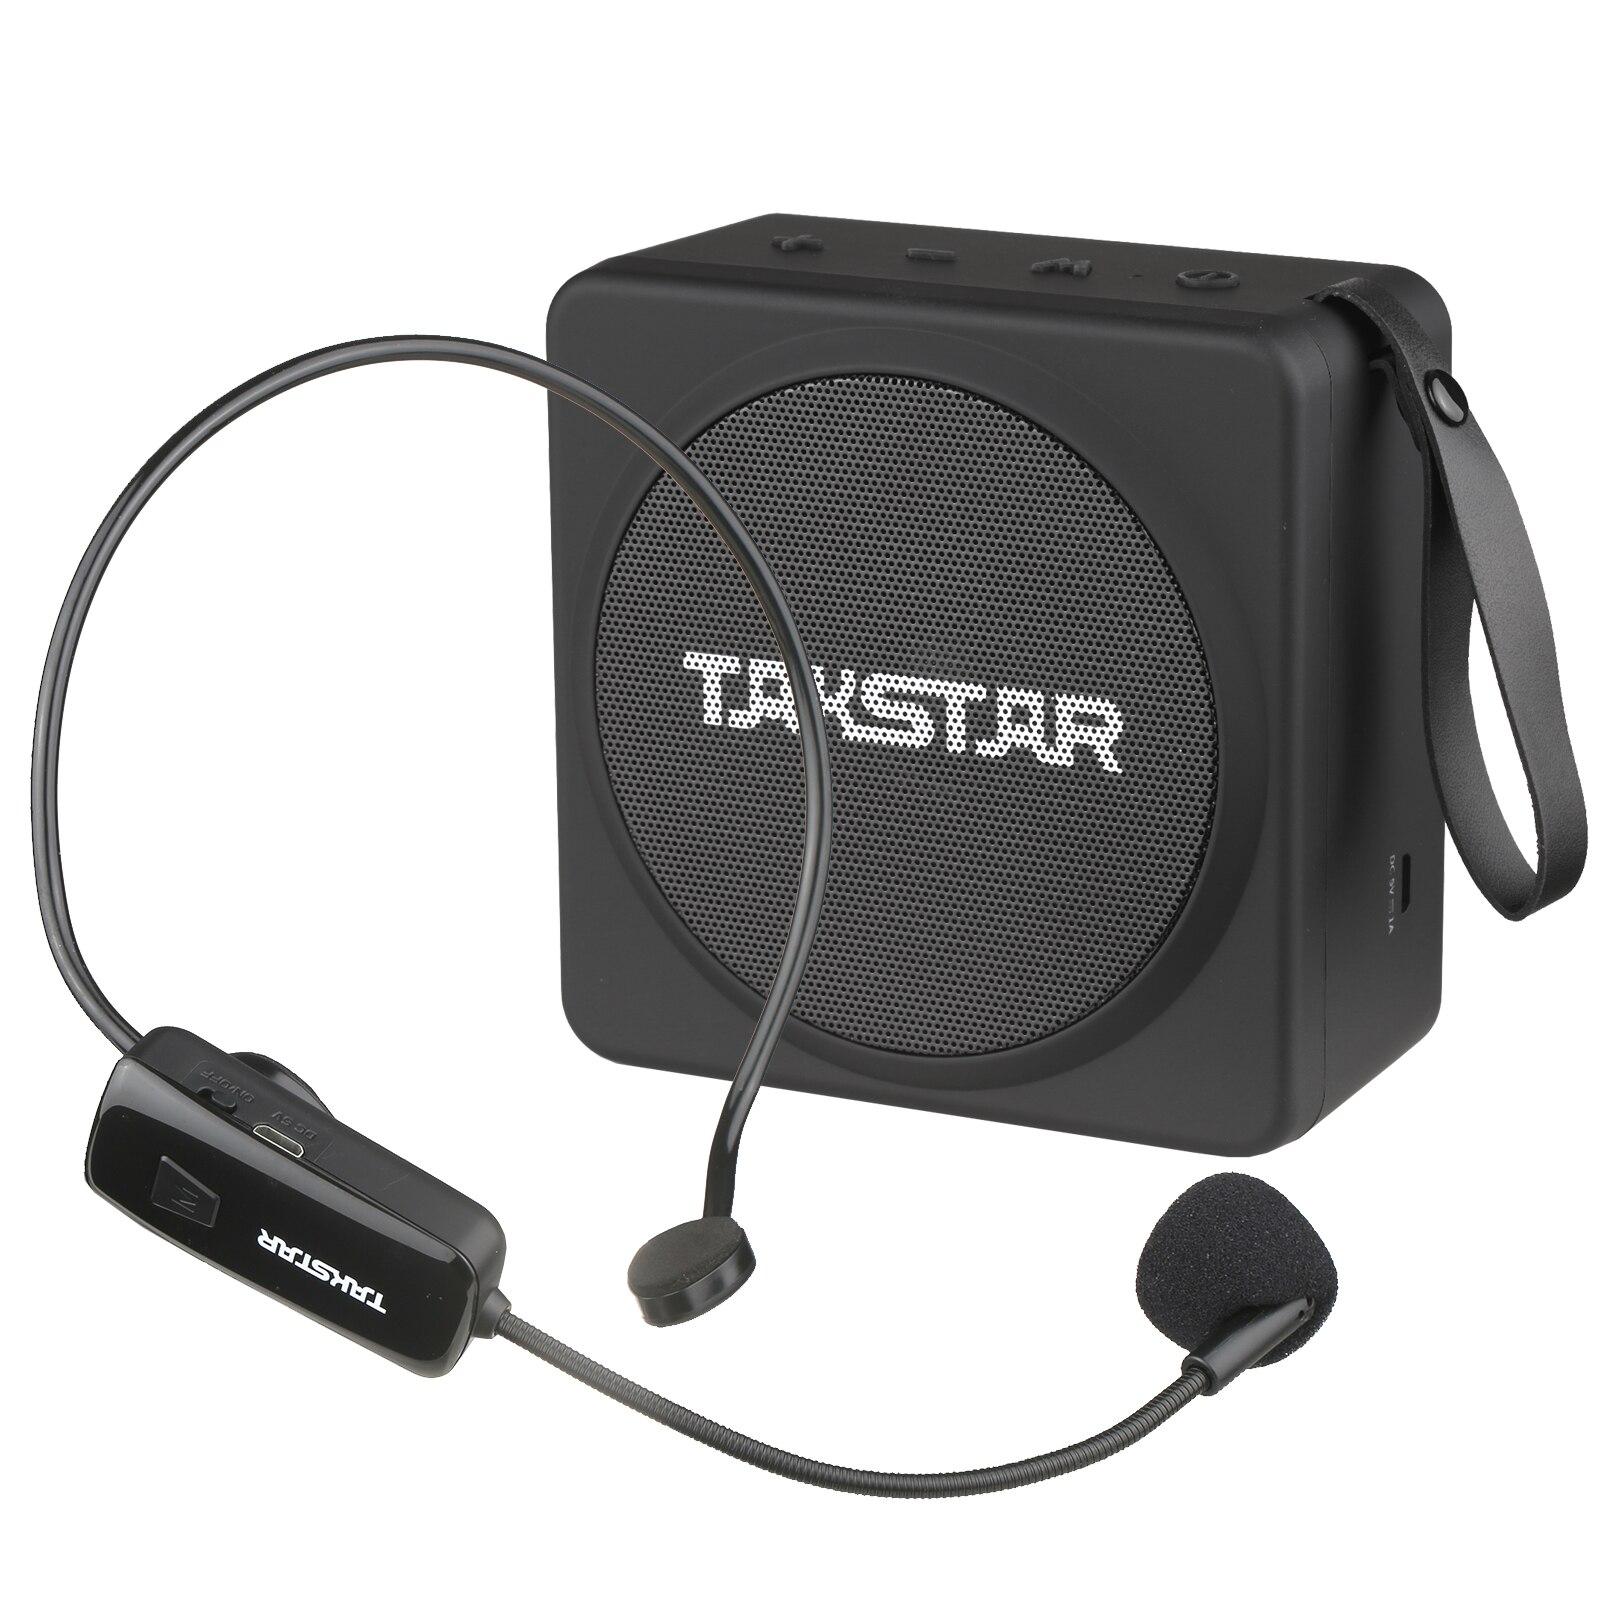 TAKSTAR محمول لاسلكي مضخم صوت قابلة للشحن مضخم لاسلكي مشغل MP3 راديو FM يده ميكروفون المعلمين UHF